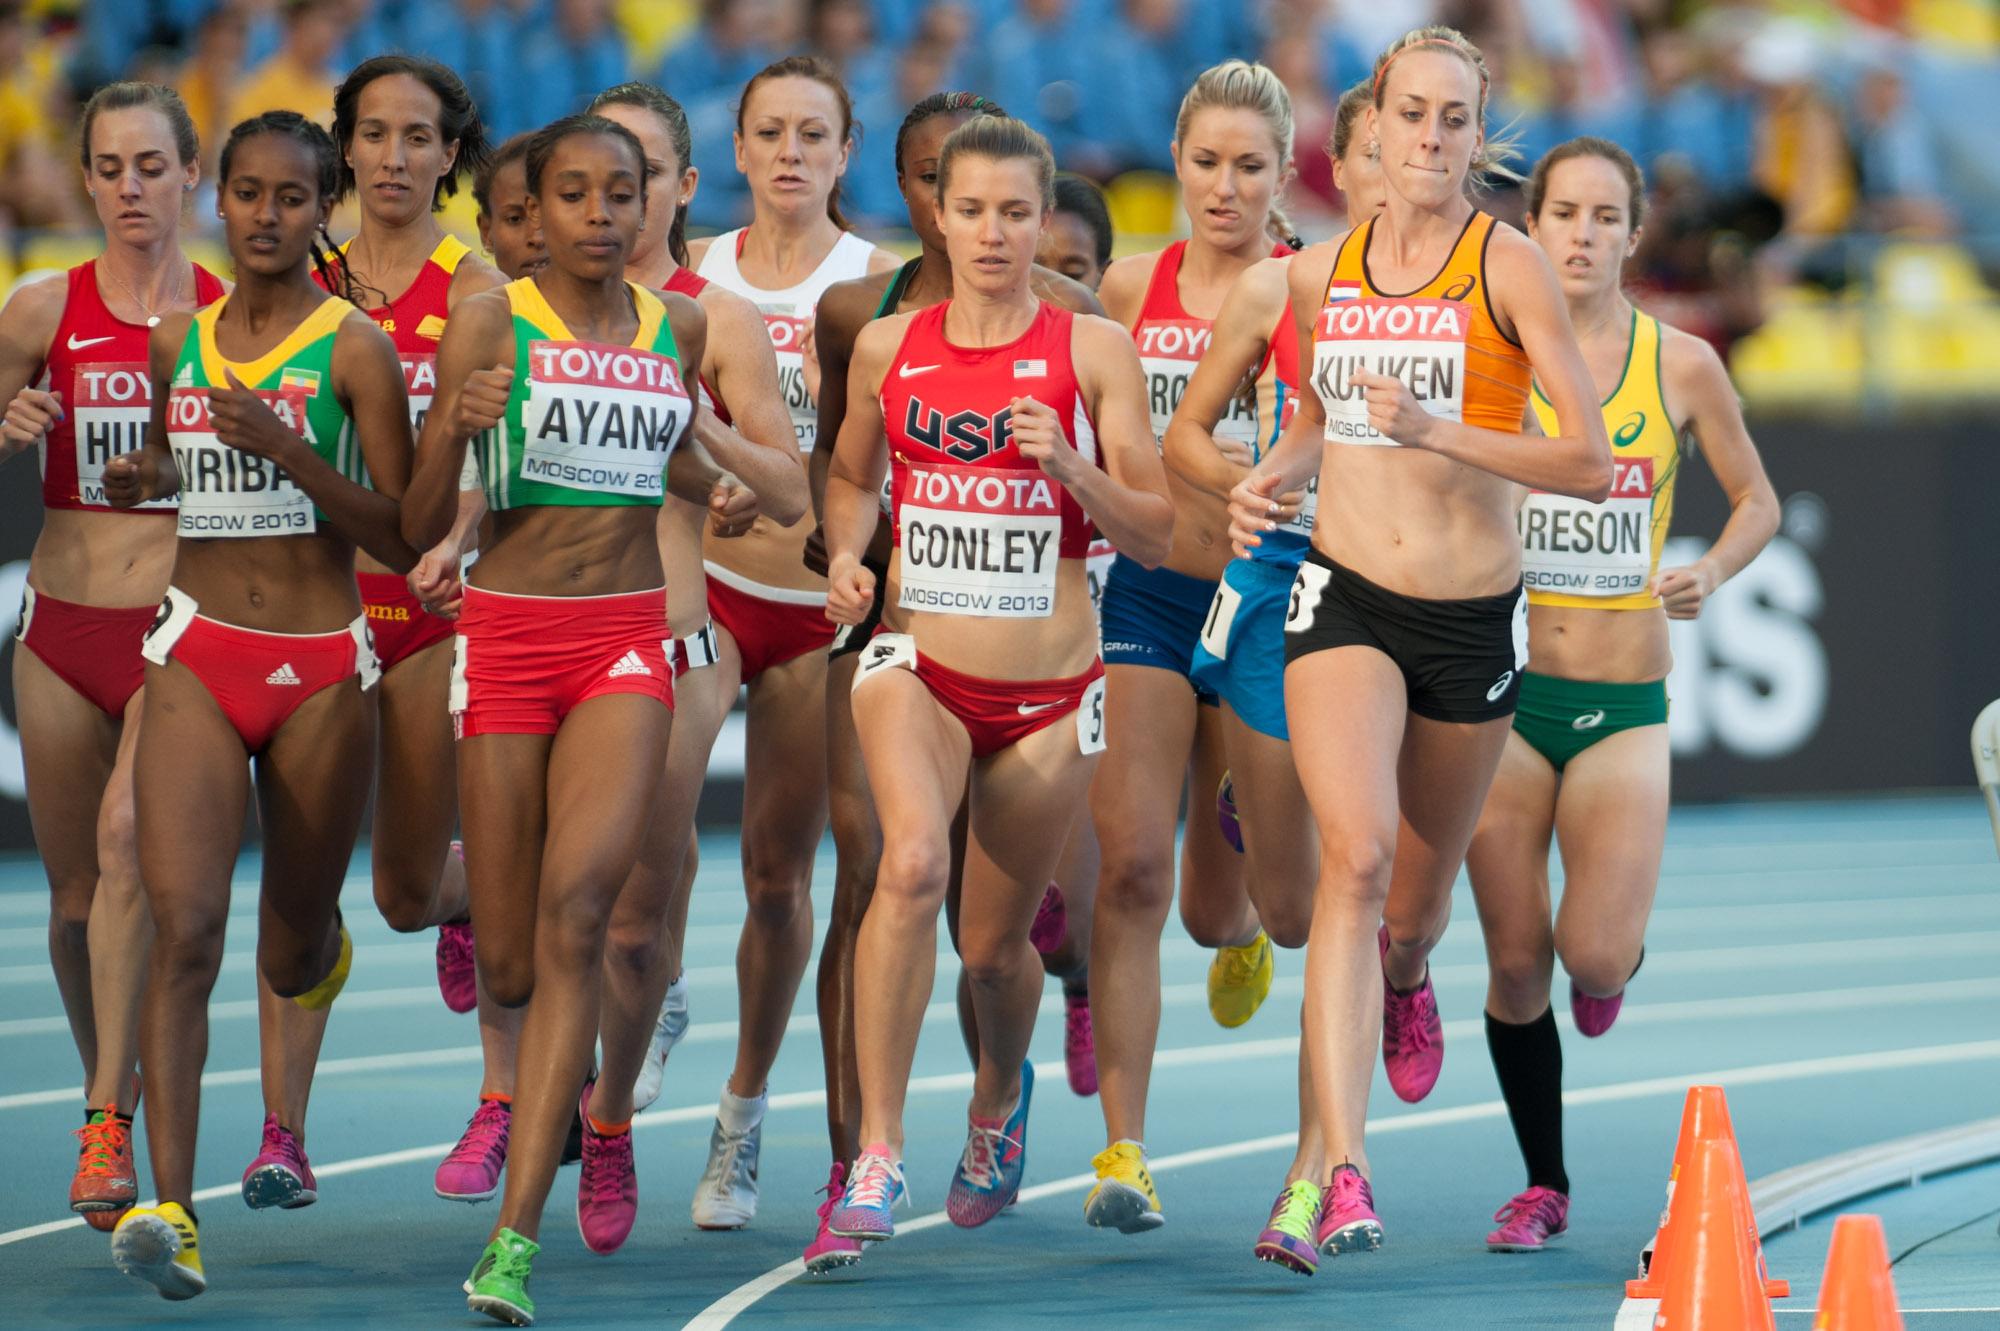 5000 metres at the World Athletics Championships - Wikipedia